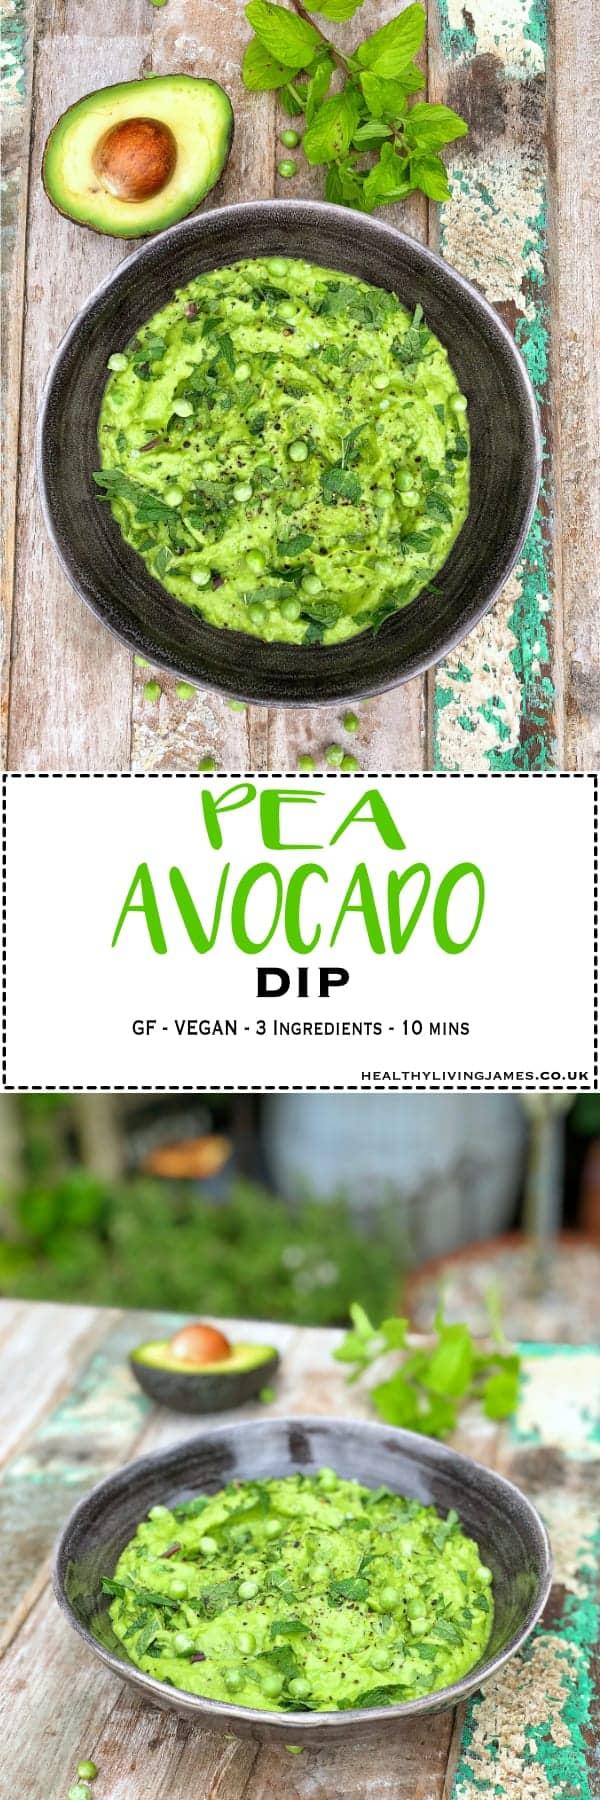 Pea & Avocado Dip